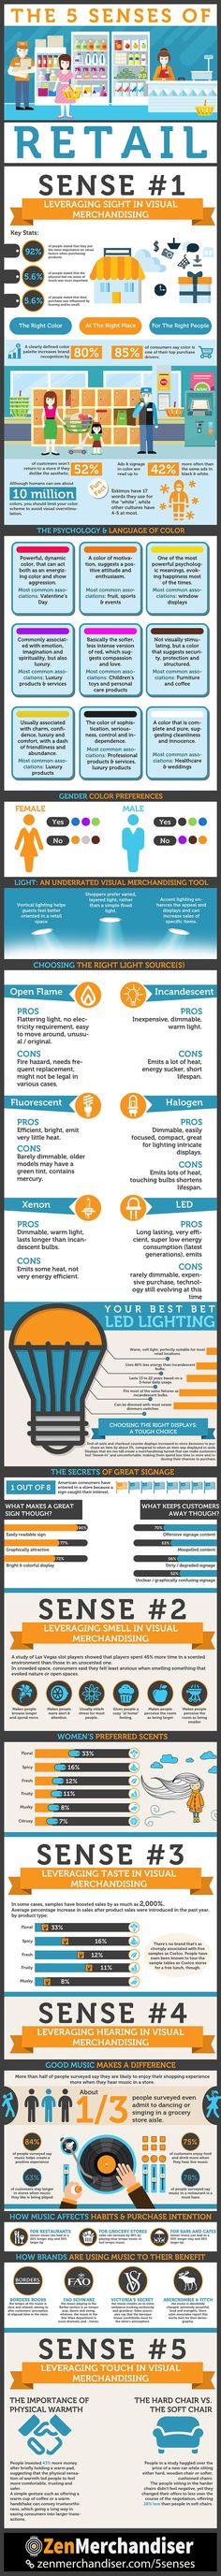 Visual Merchandising Infographic - The 5 Senses of Retail